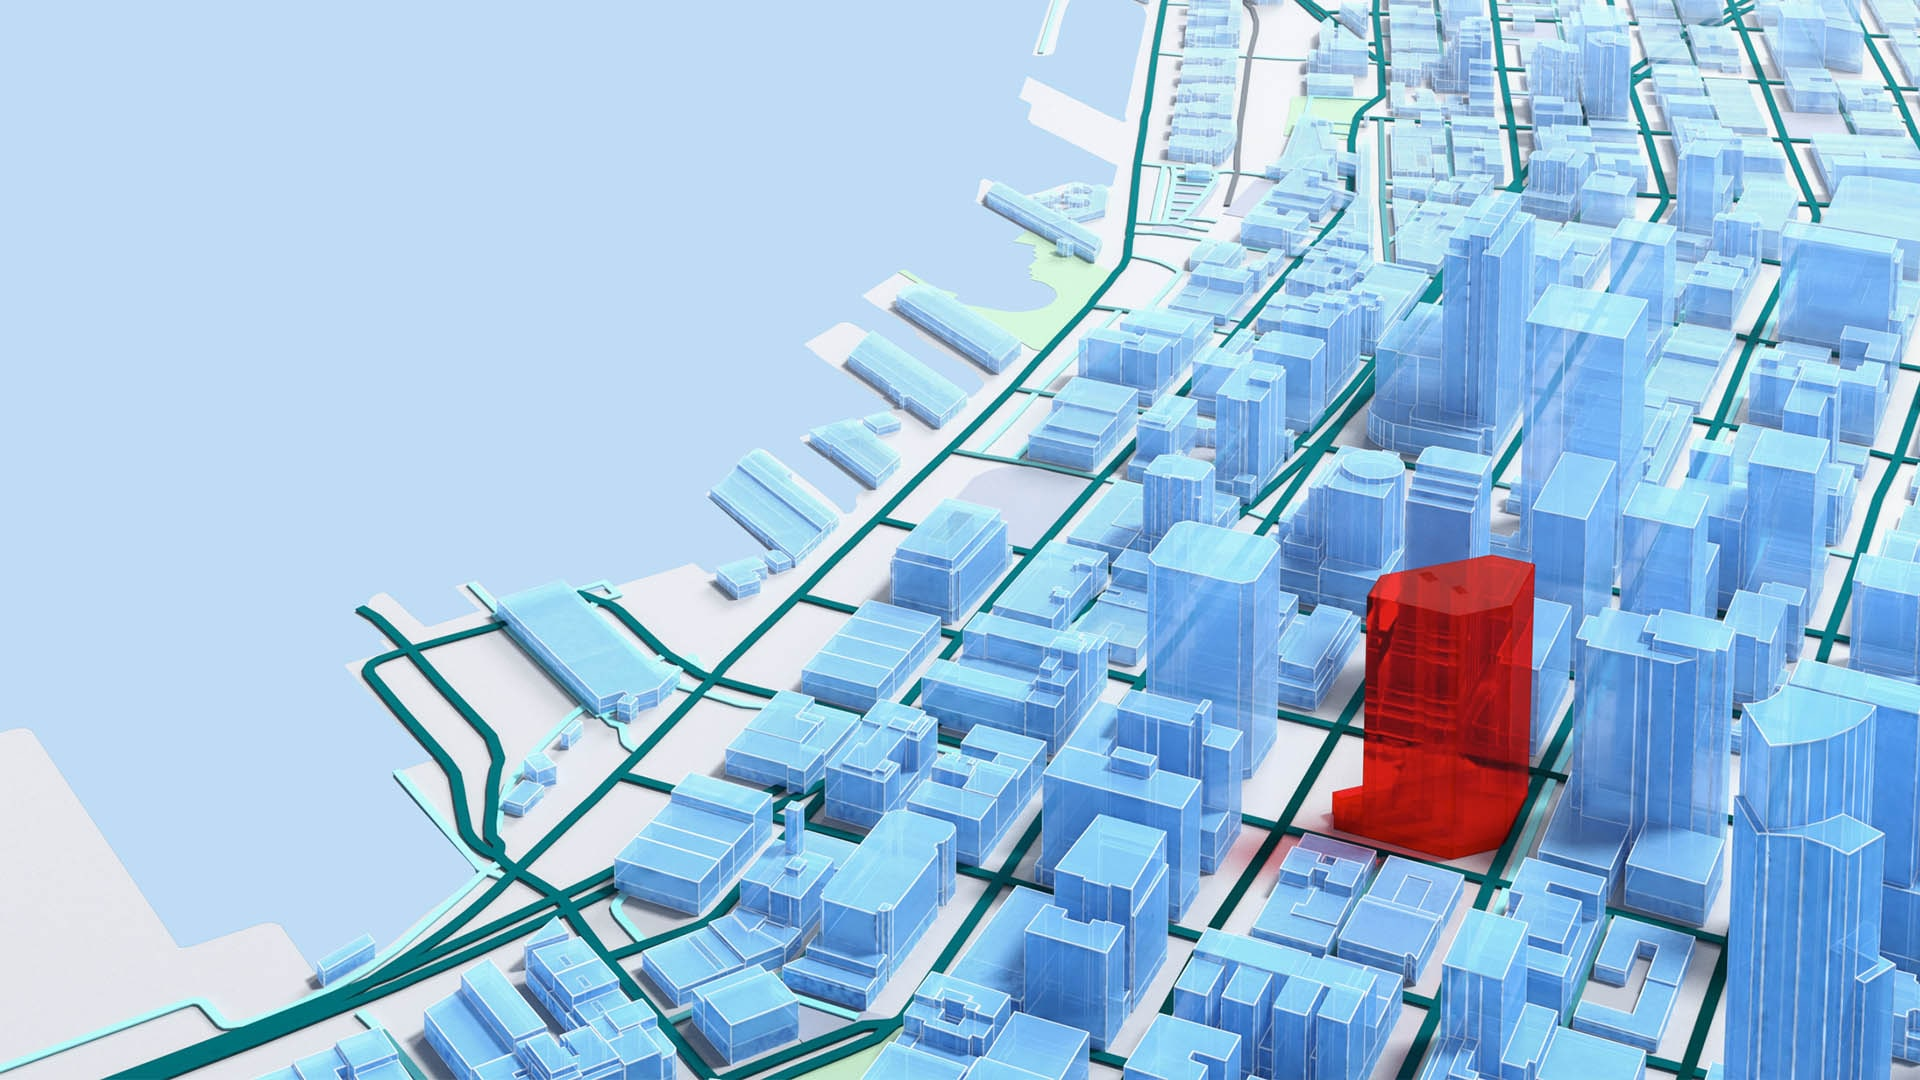 TomTom Map technology